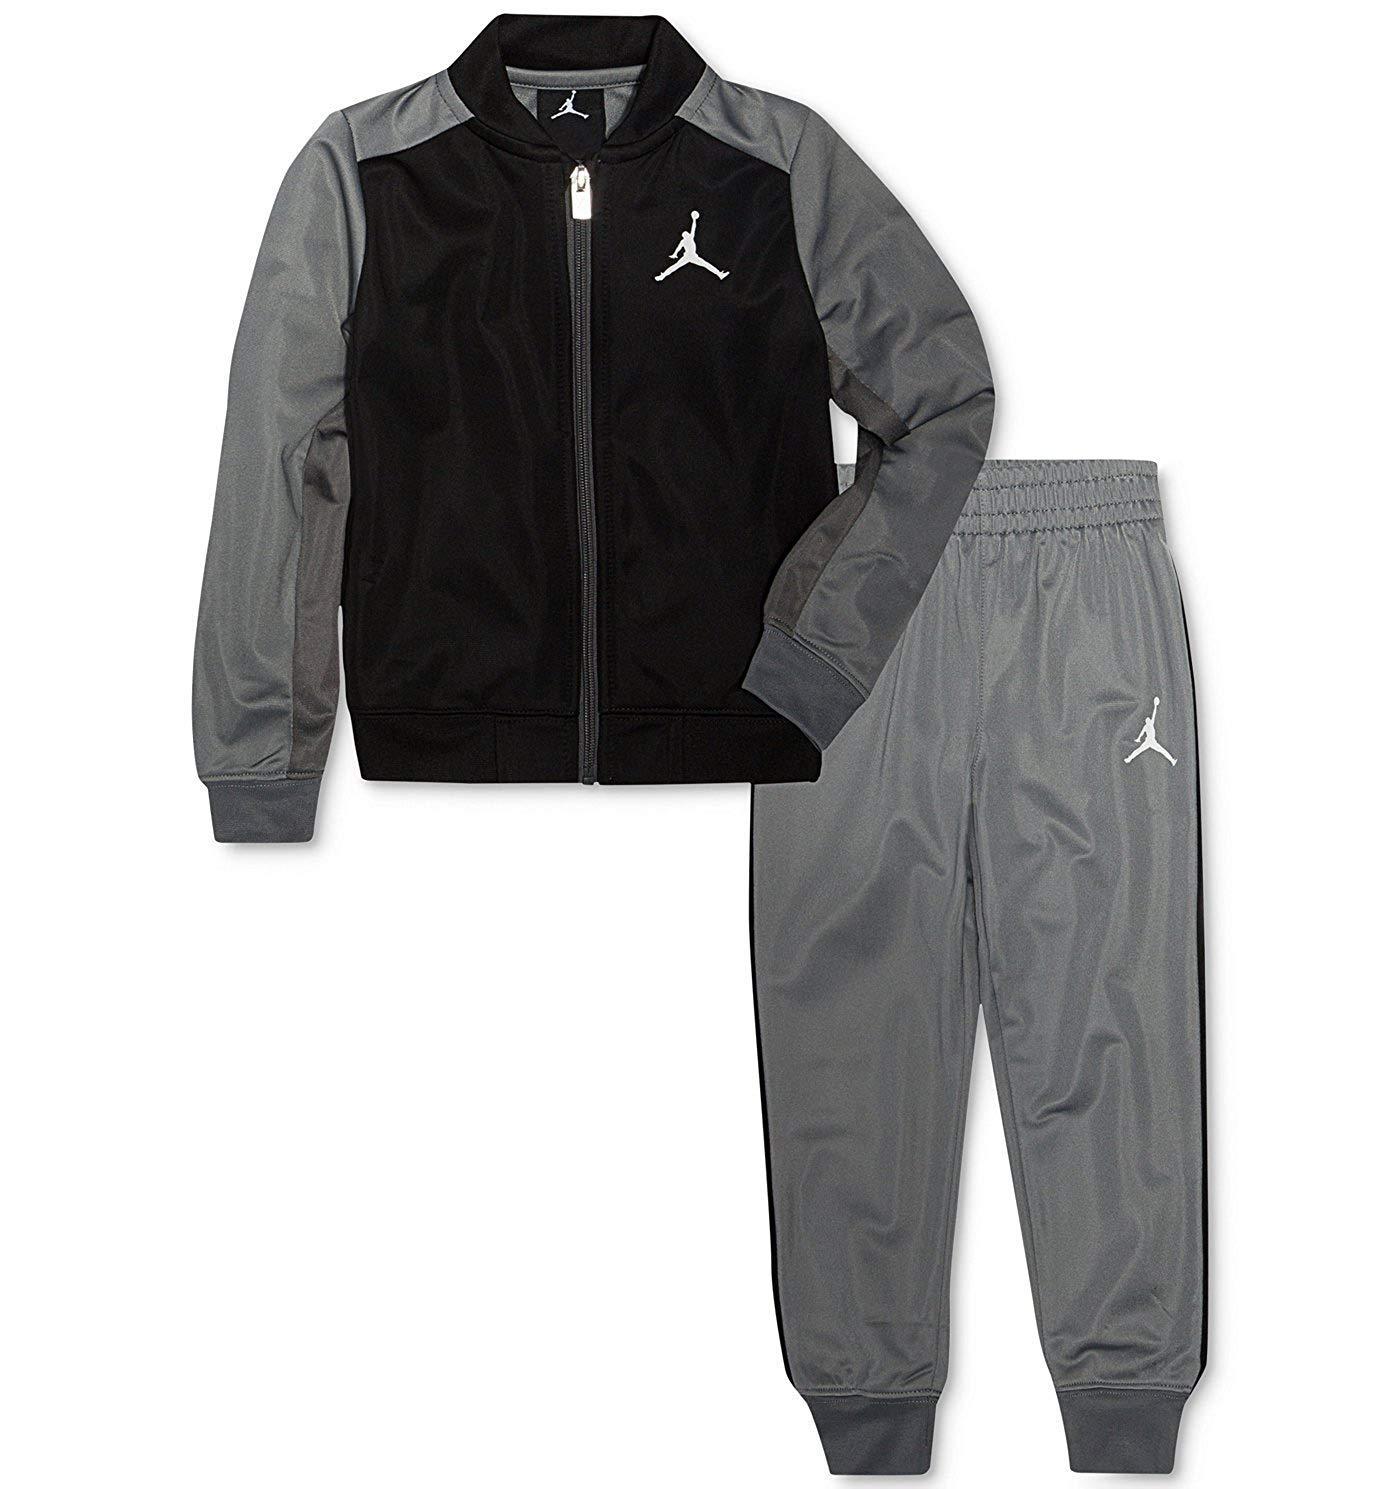 Jordan Nike Air Little Boys Tricot Tracksuit Jacket & Pants Set (Black/Grey, 6)